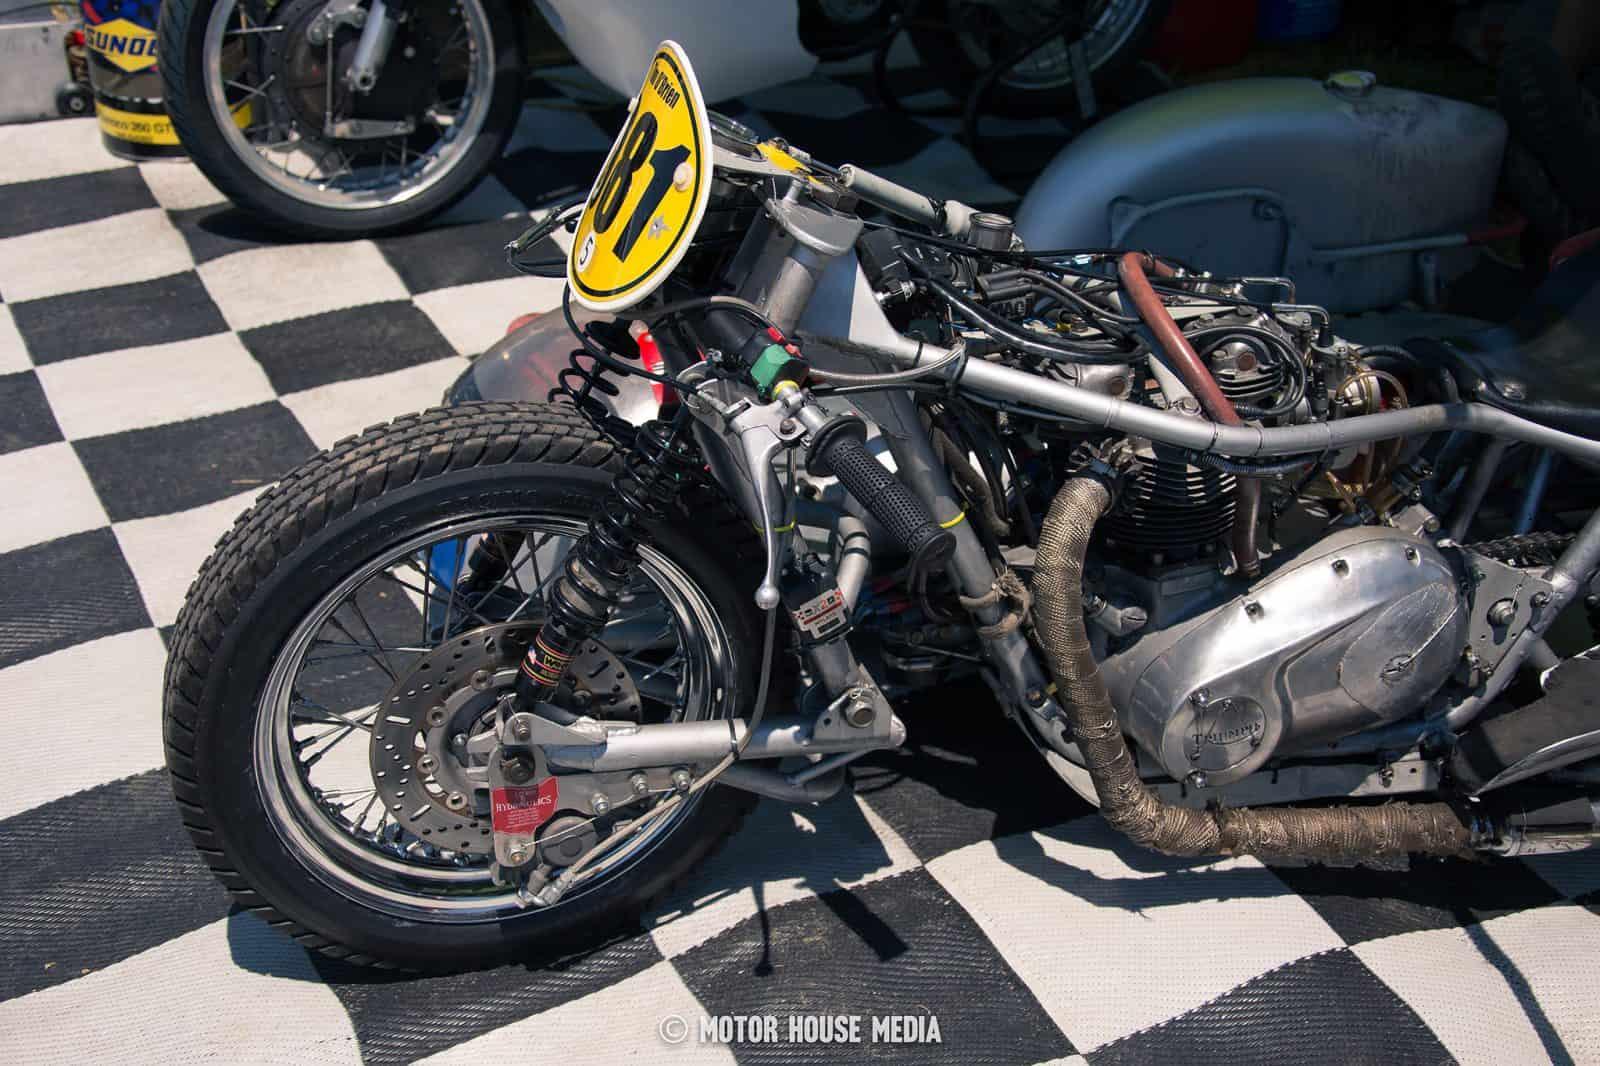 AHRMA vintage Sidecar bikes